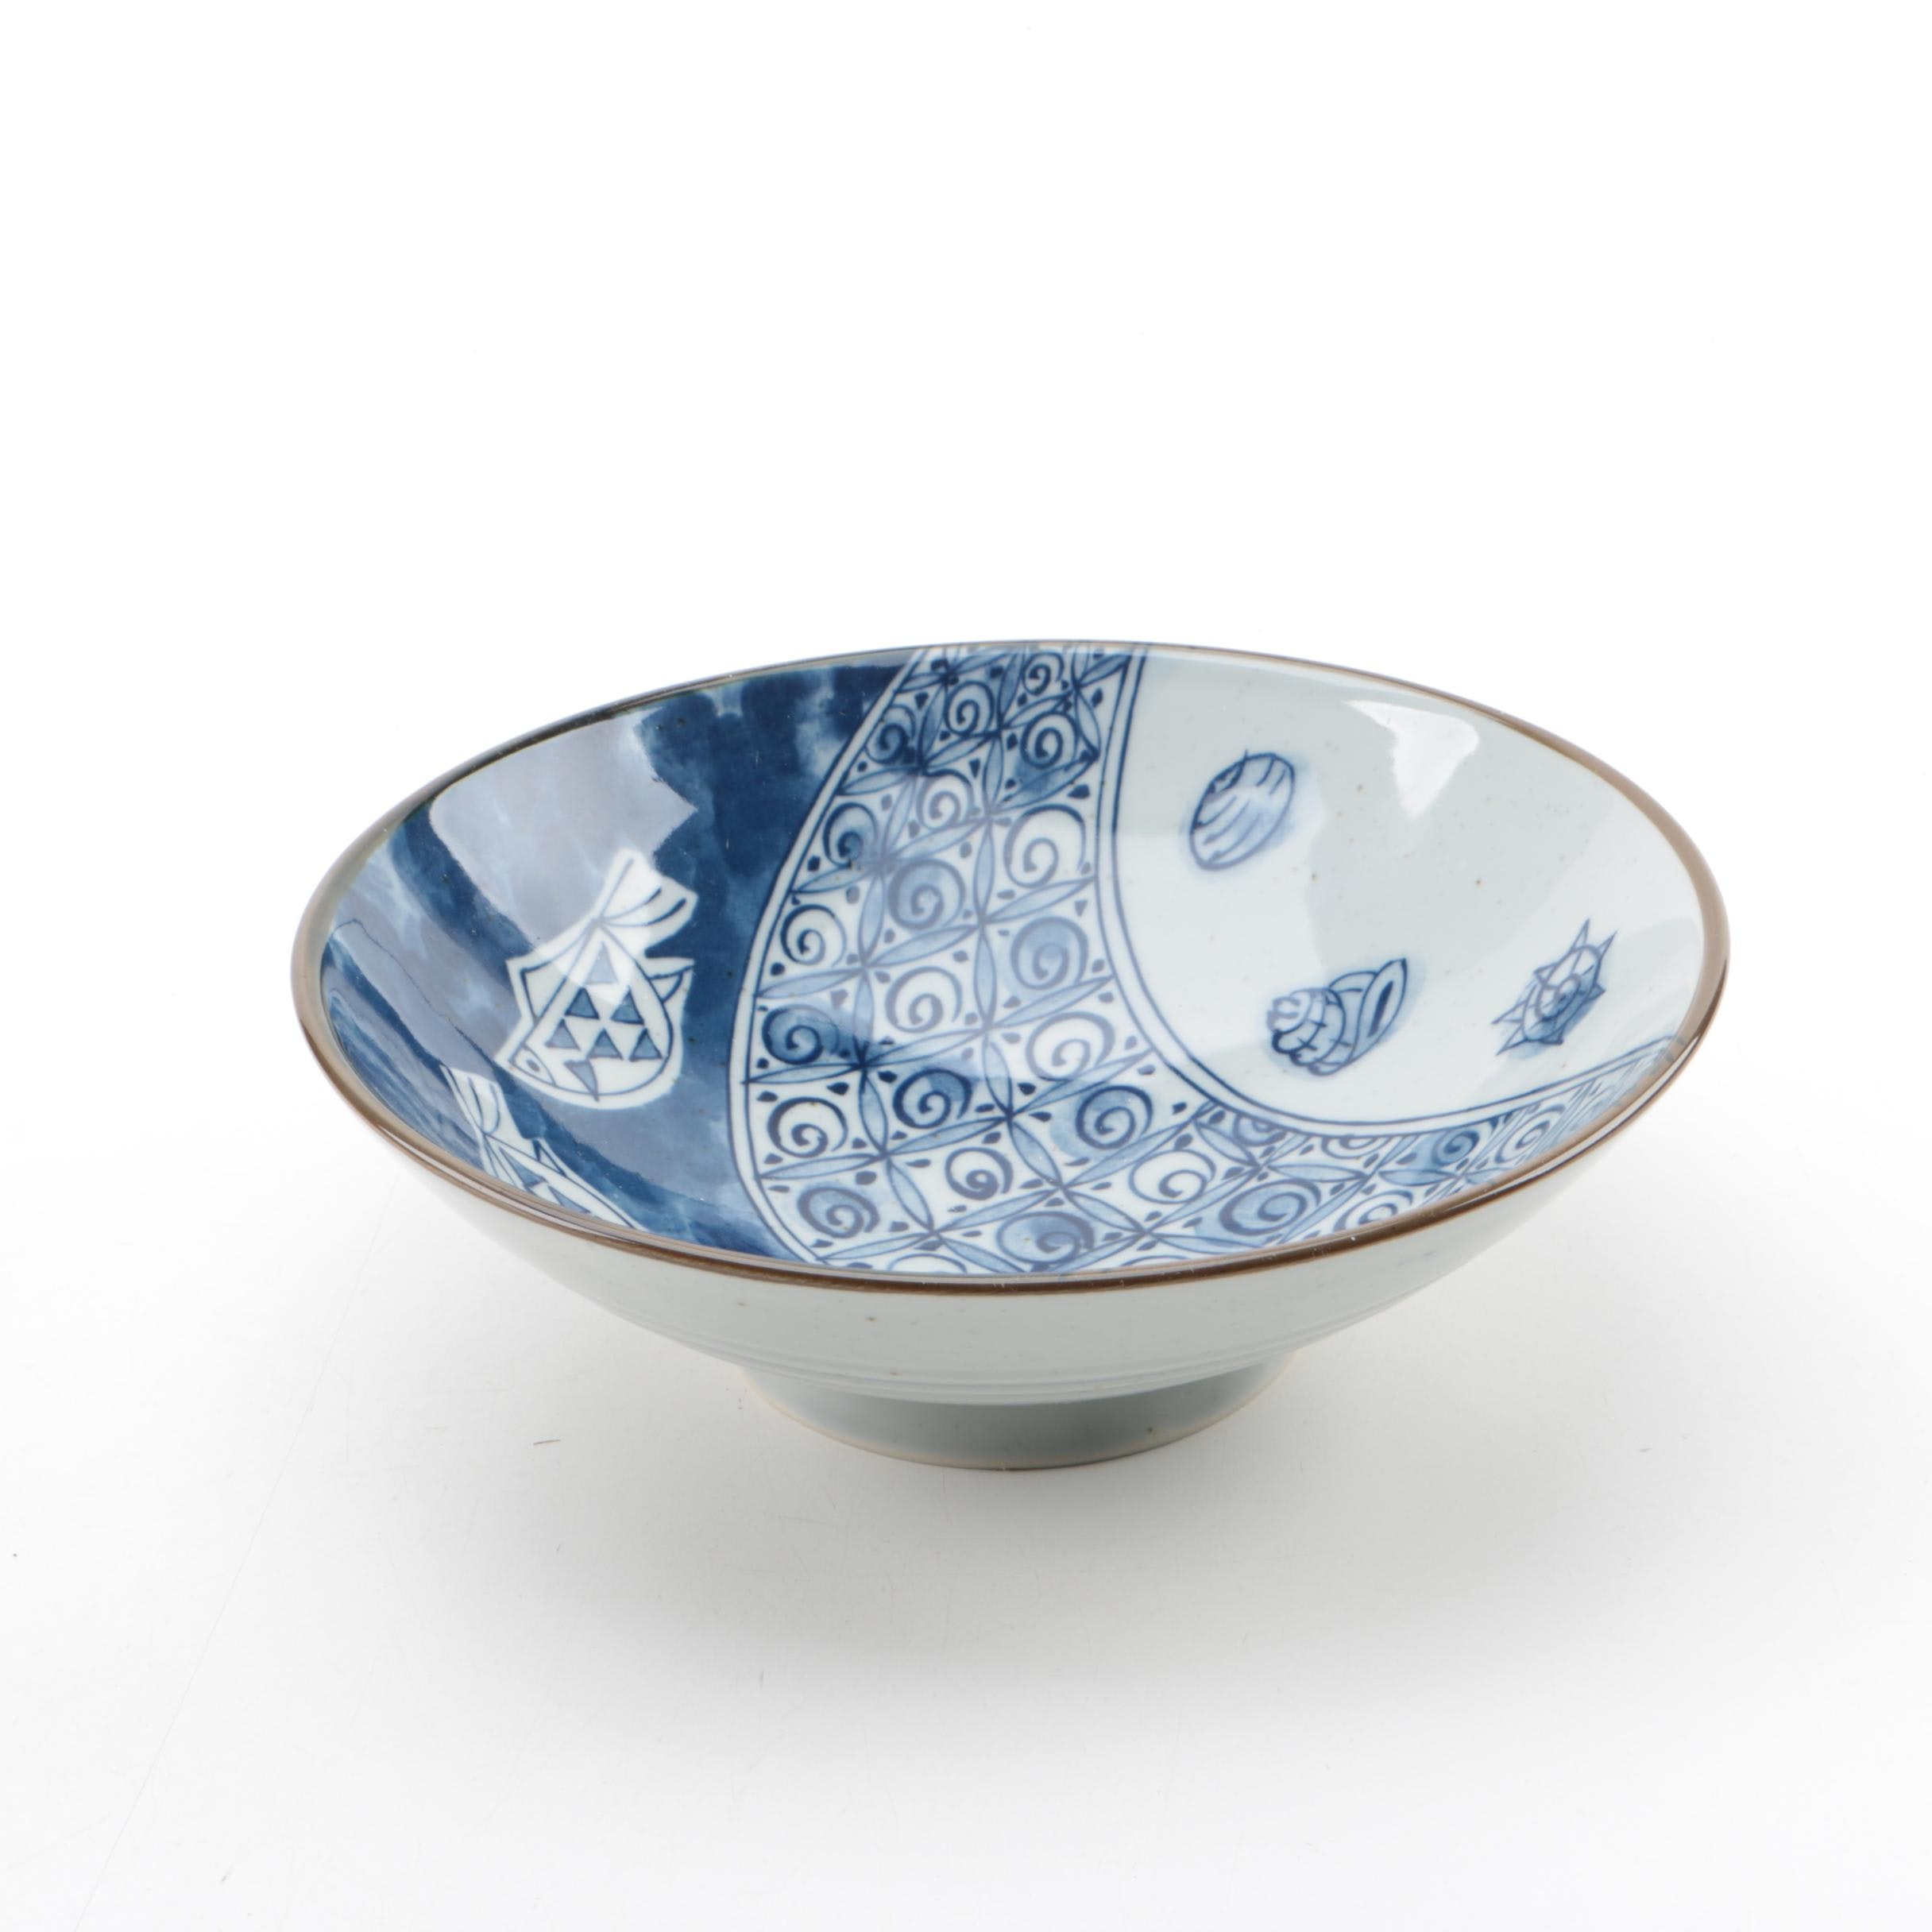 Japanese Blue and White Porcelain Bowl